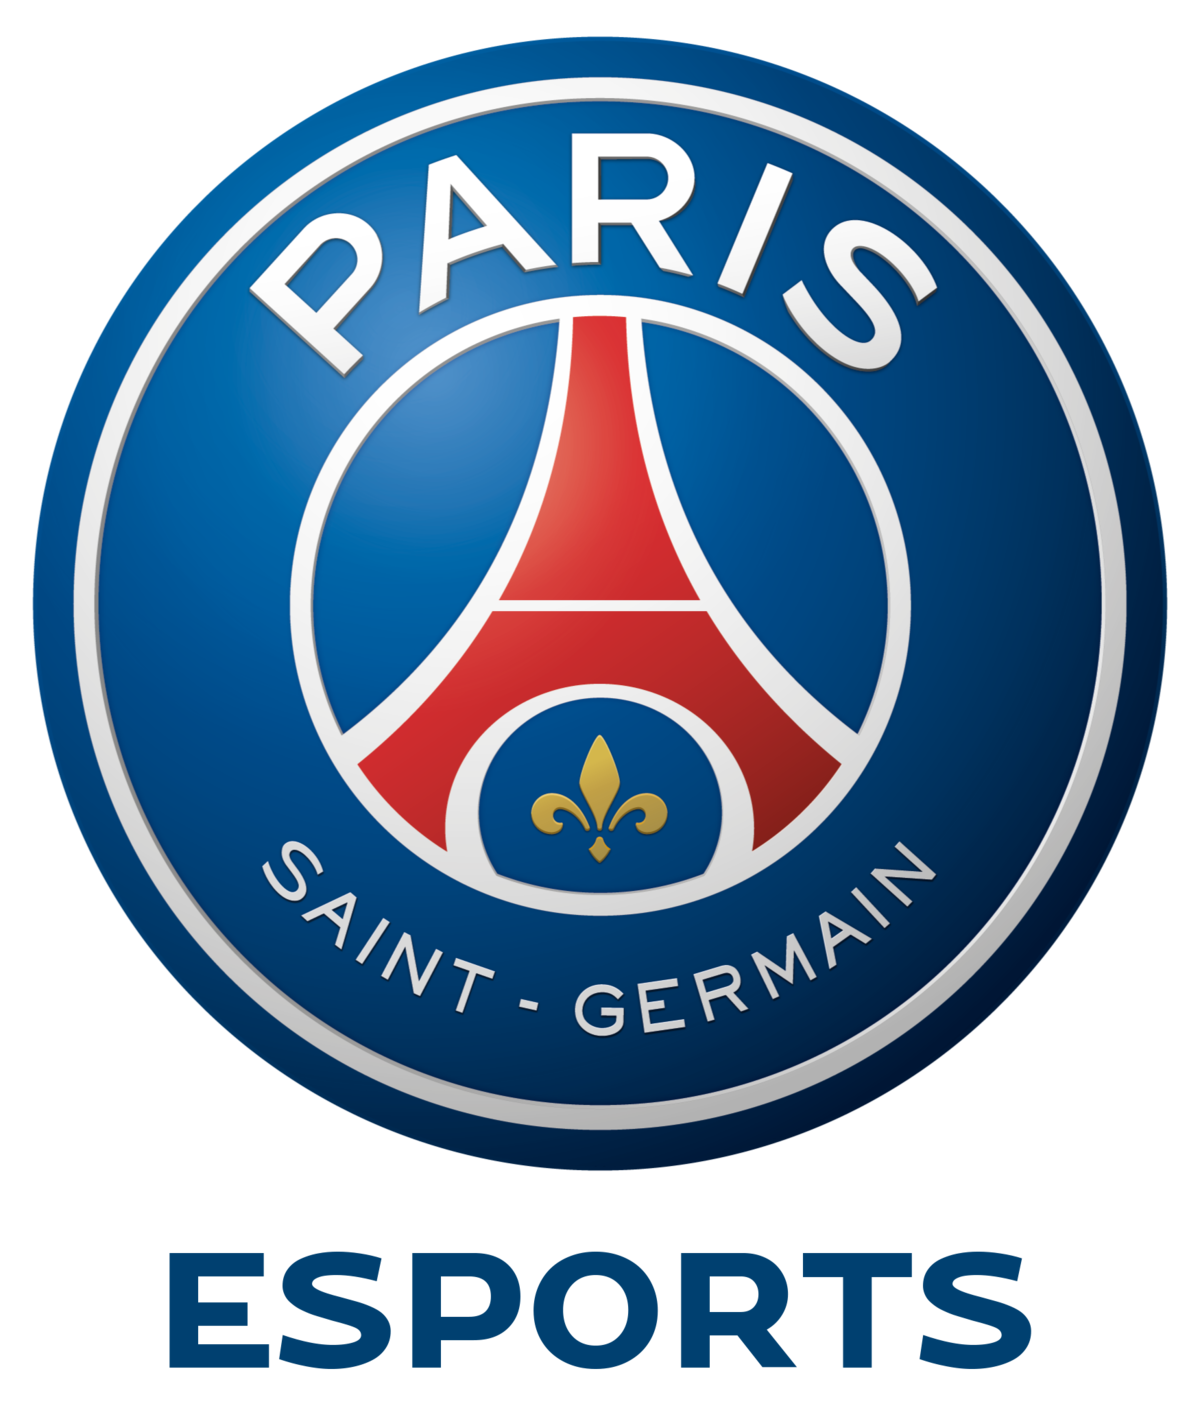 1200px-PSG_Esports_logo.png